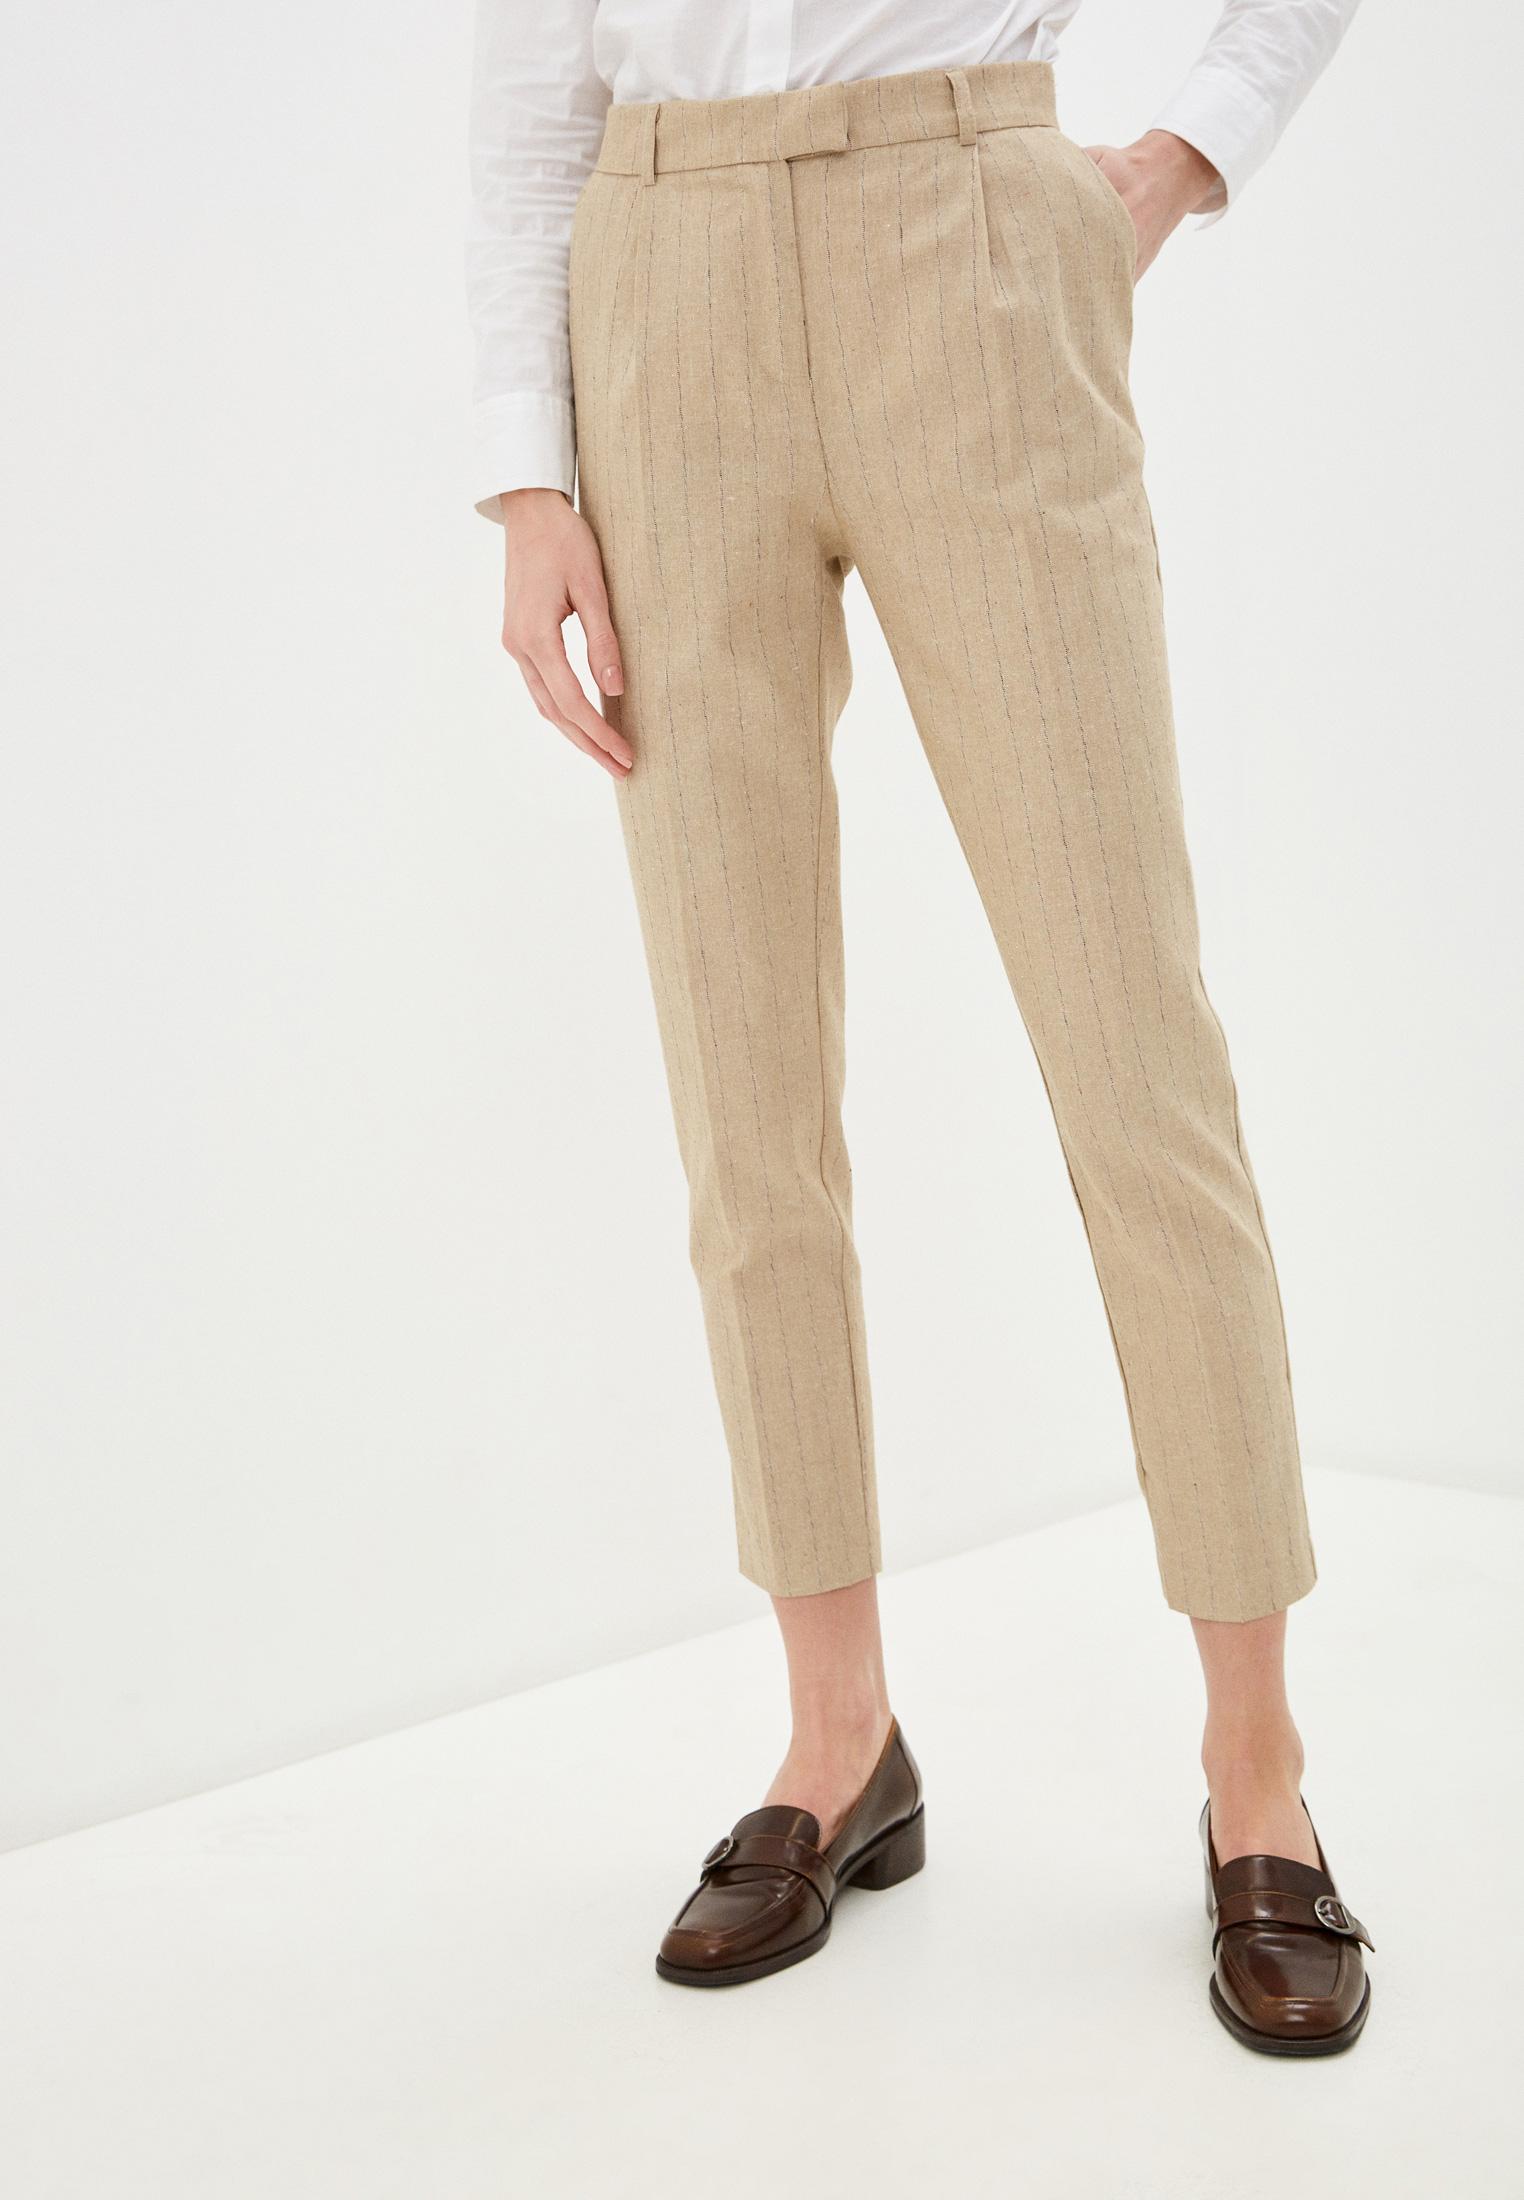 Женские классические брюки Savage (Саваж) 015403/31